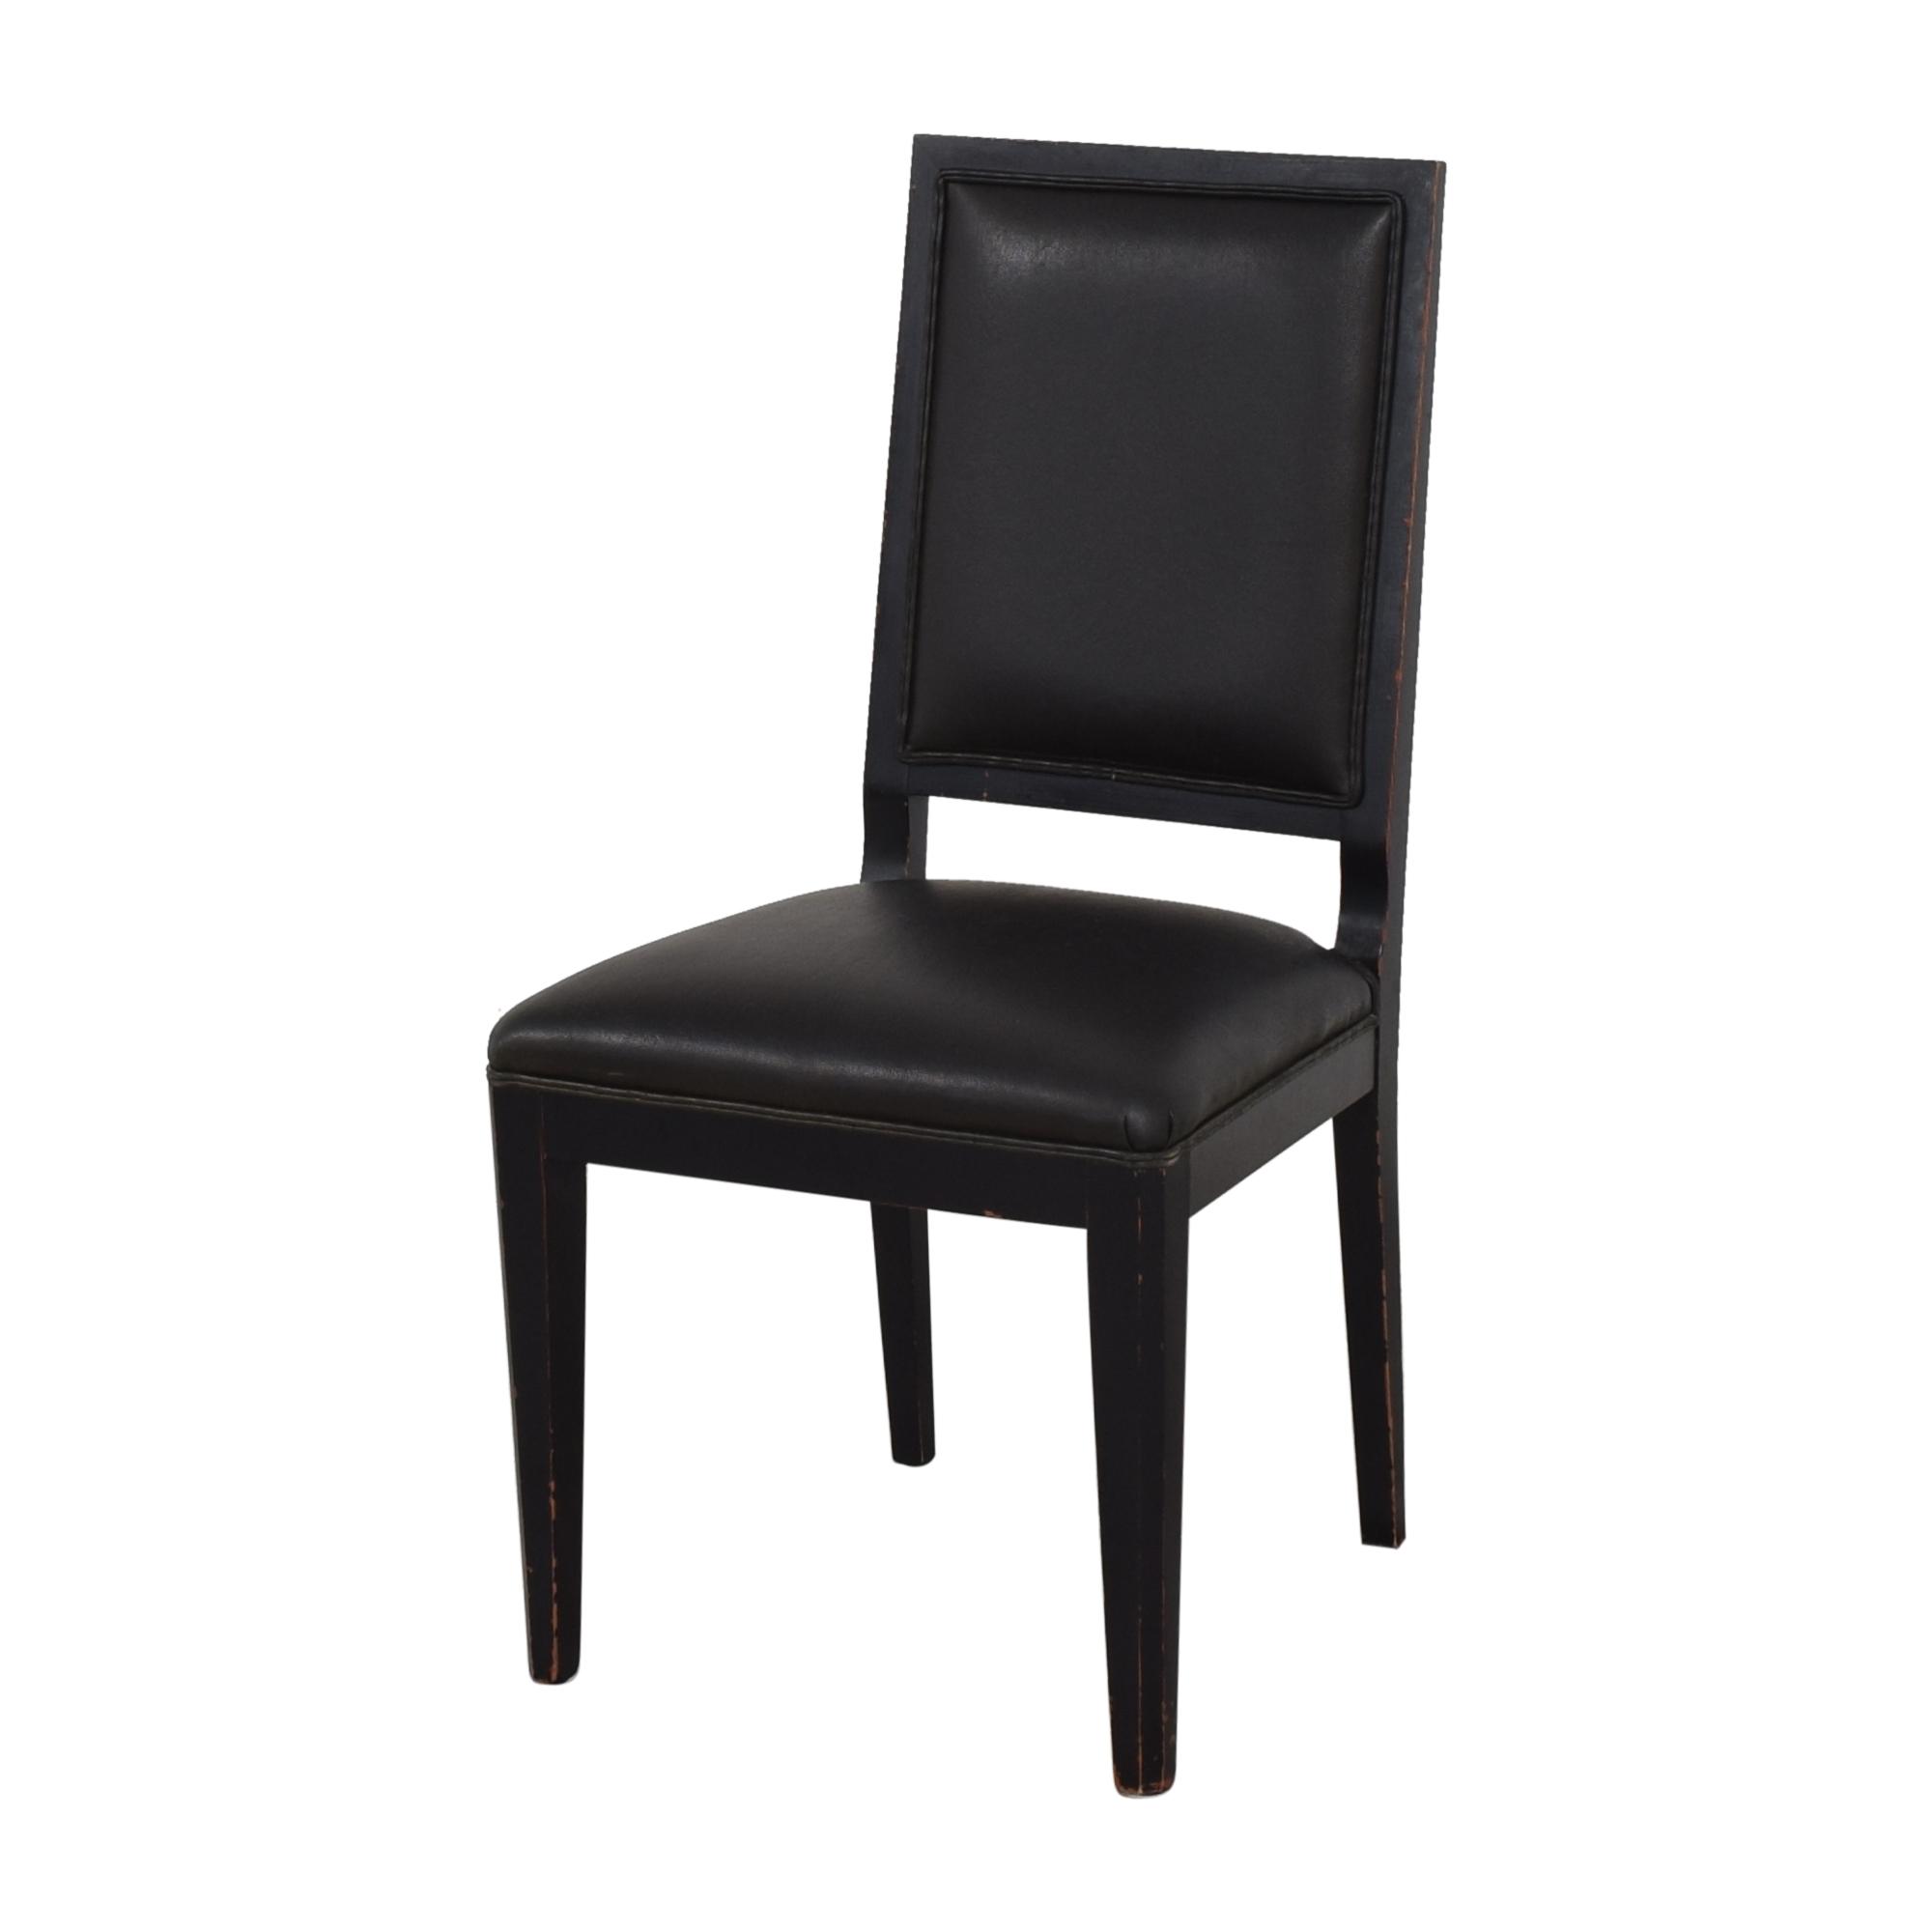 Crate & Barrel Crate & Barrel Sonata Dining Chairs black